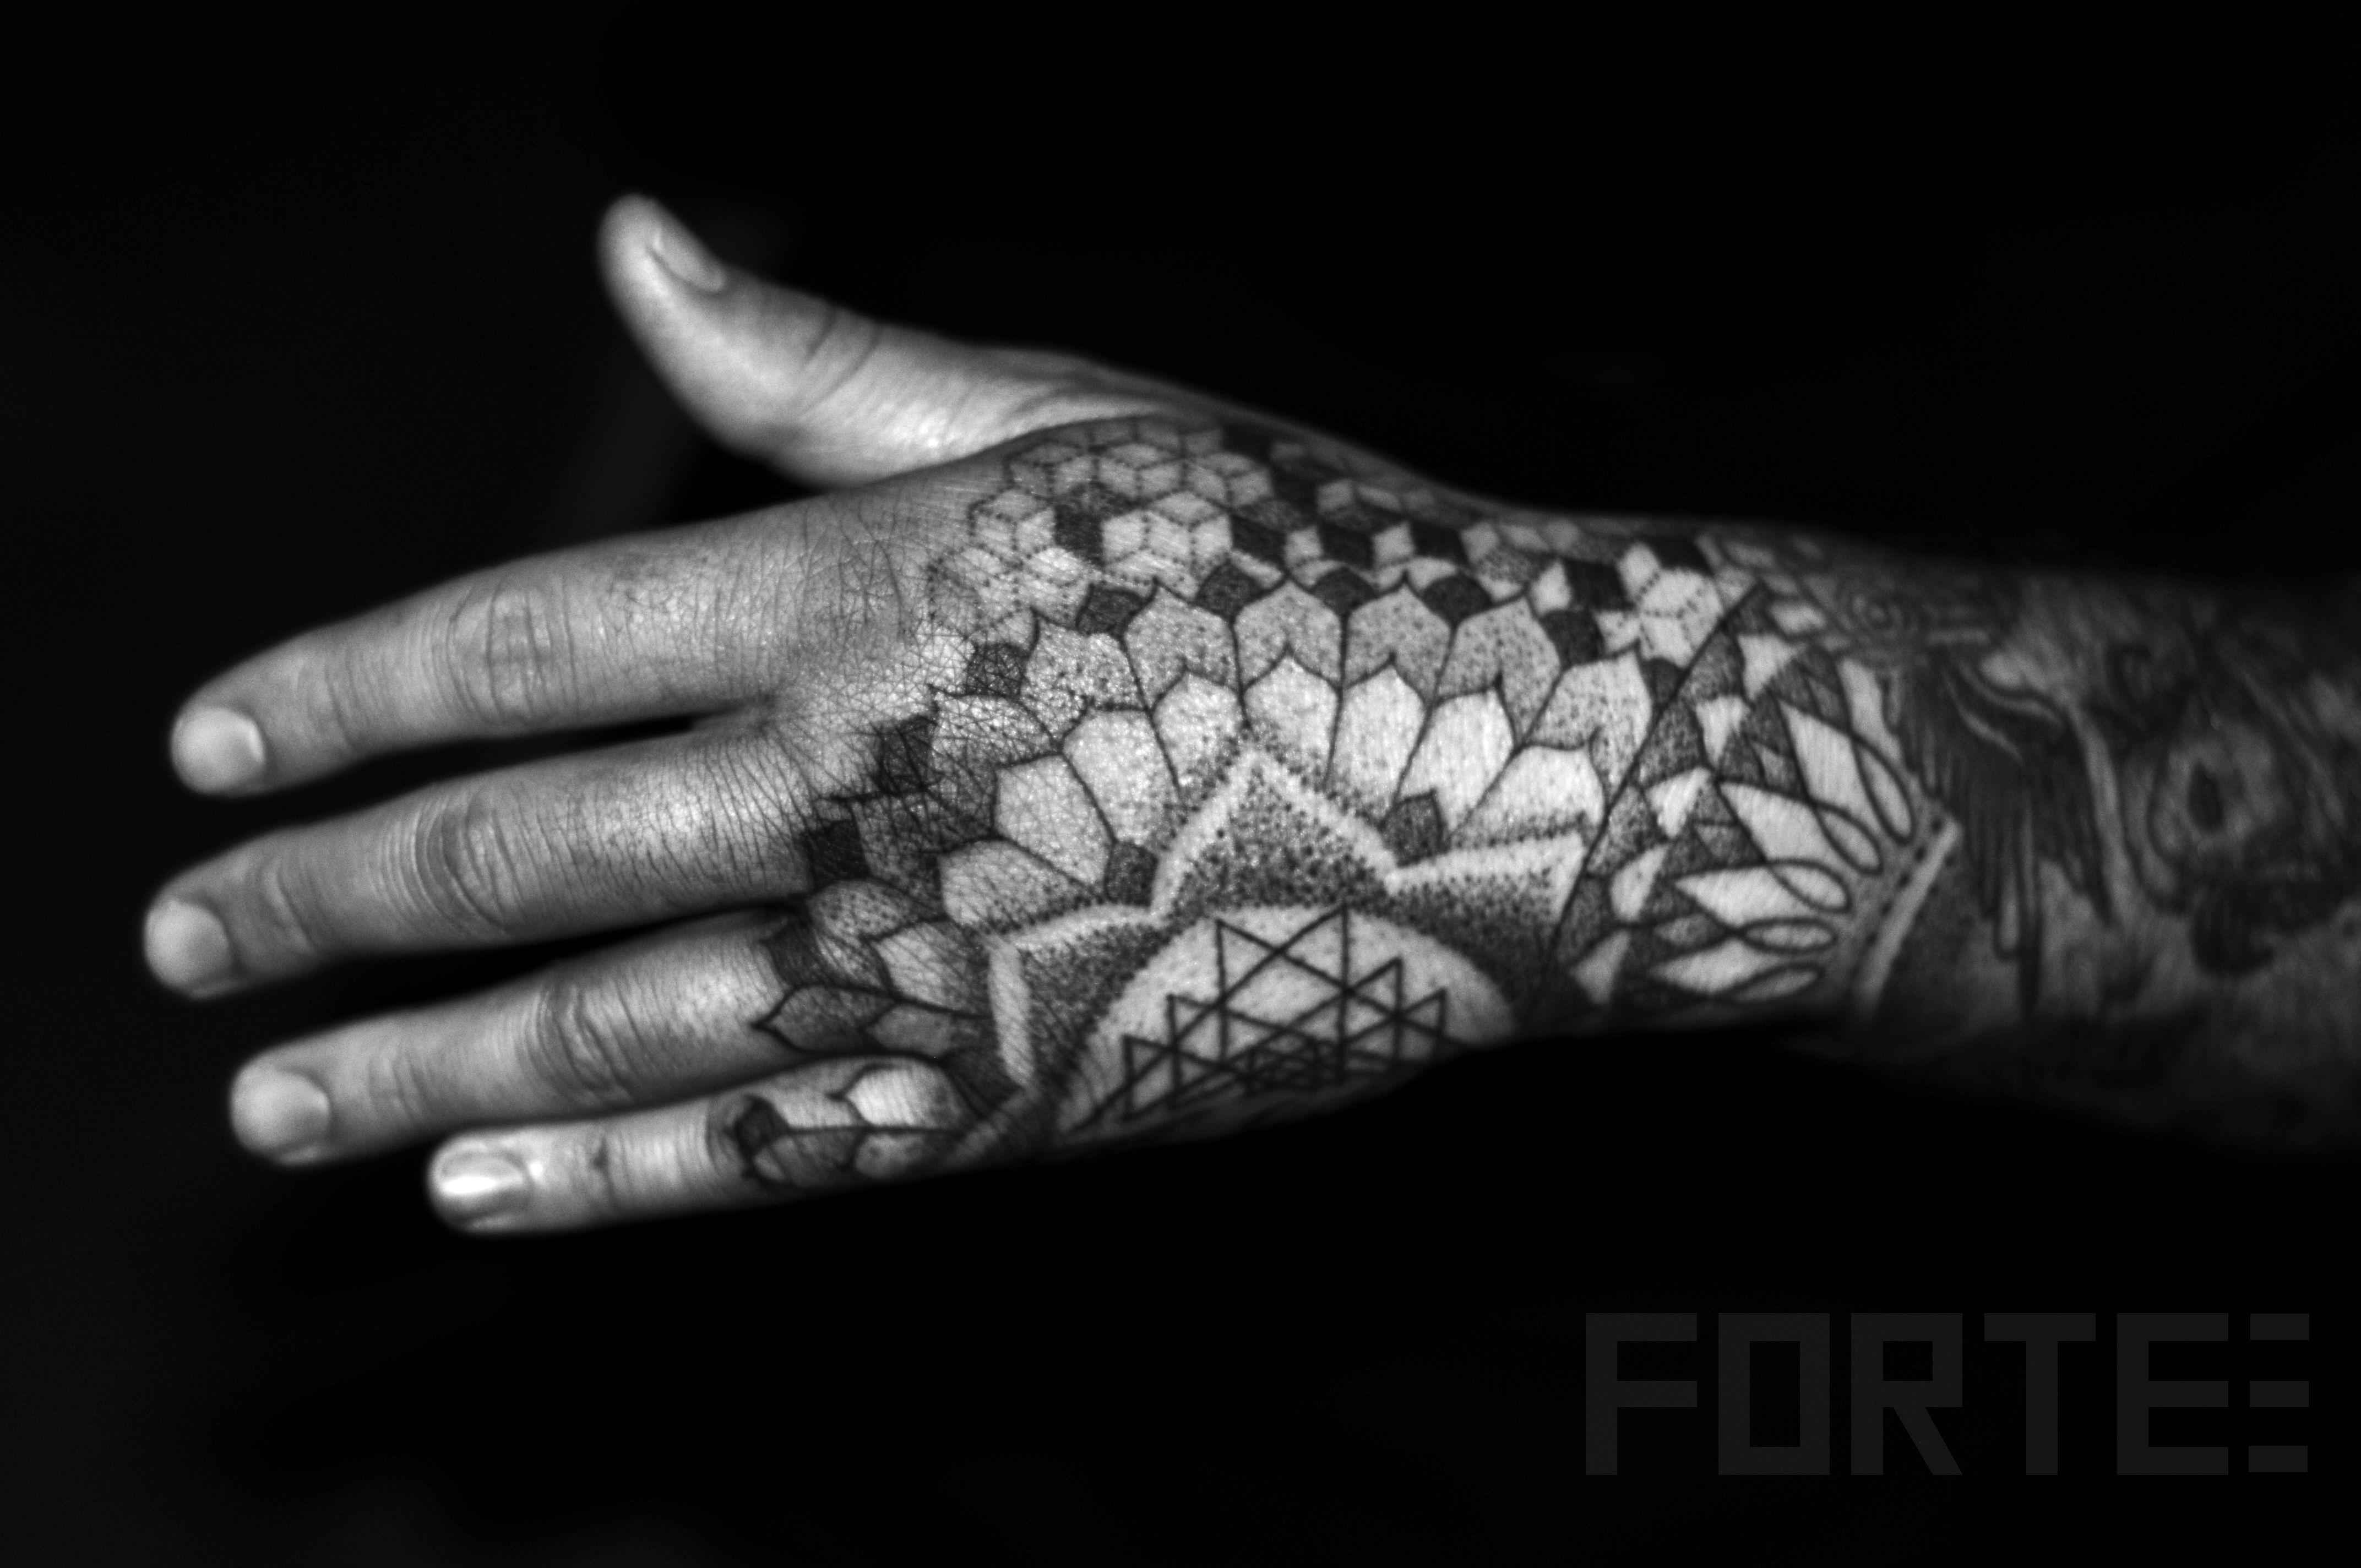 Http Tattoo Ideas Us Sacred Geometry Hand Tattoo On Jdotcolombo Hand Tattoos For Guys Mandala Hand Tattoos Geometric Tattoo